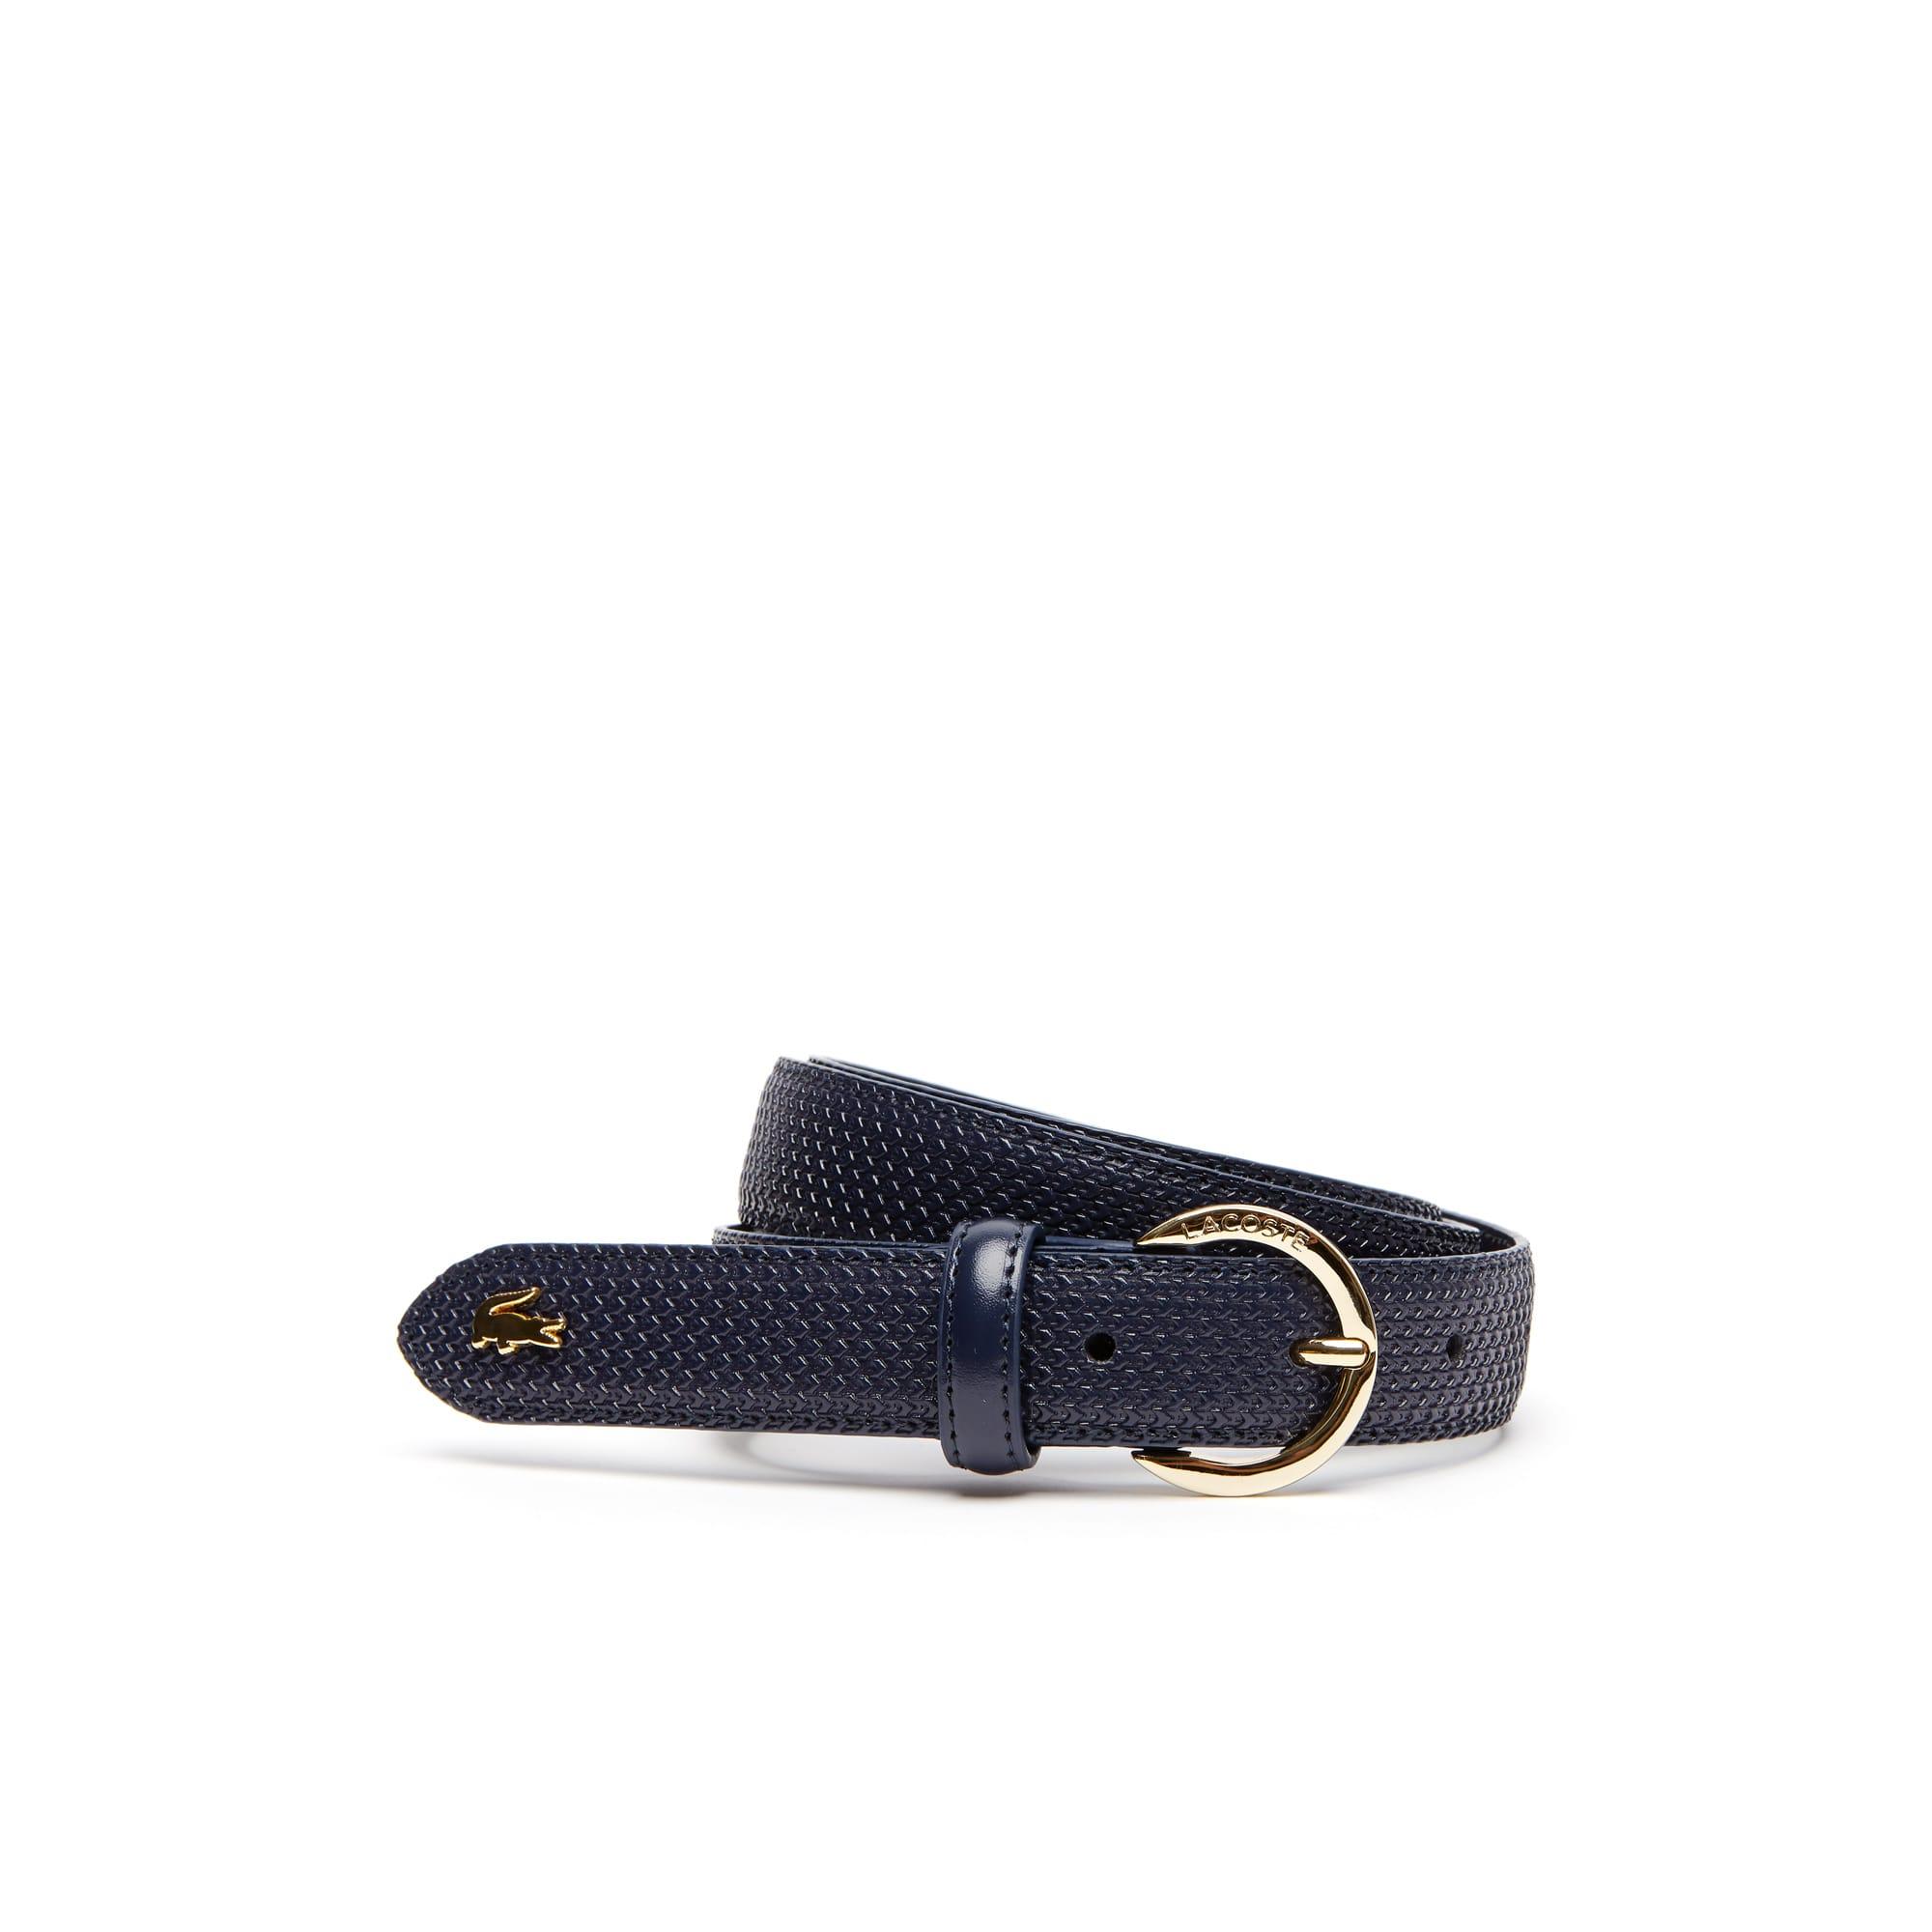 87ab20754a5d72 Belts collection